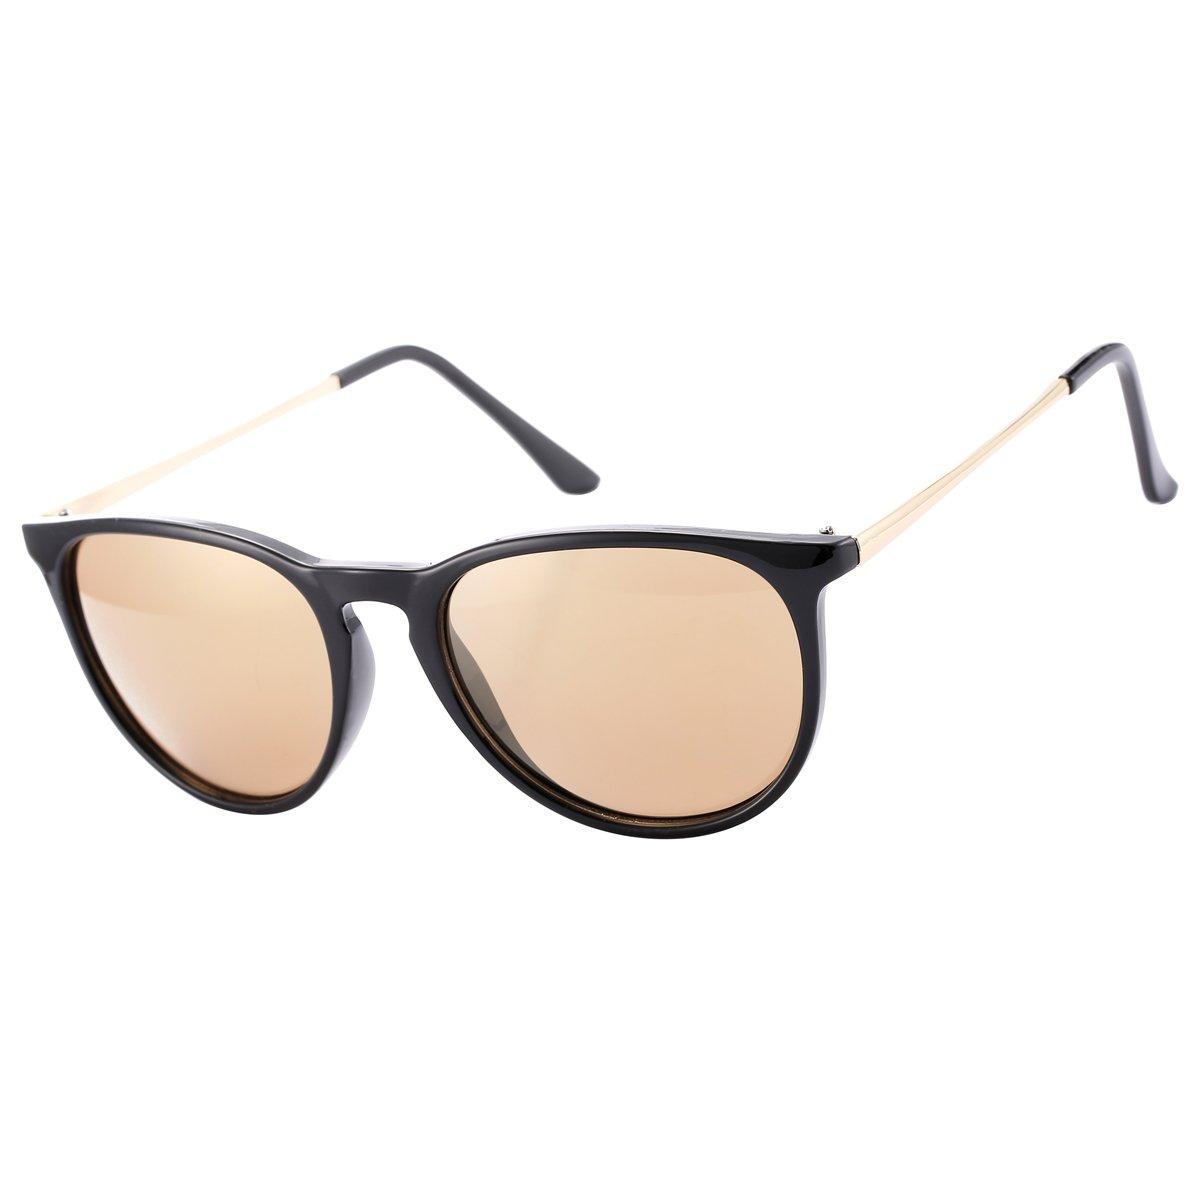 751740cb07b Amazon.com  COASION Vintage Round Sunglasses for Women – UV 400 Protection  (Gold